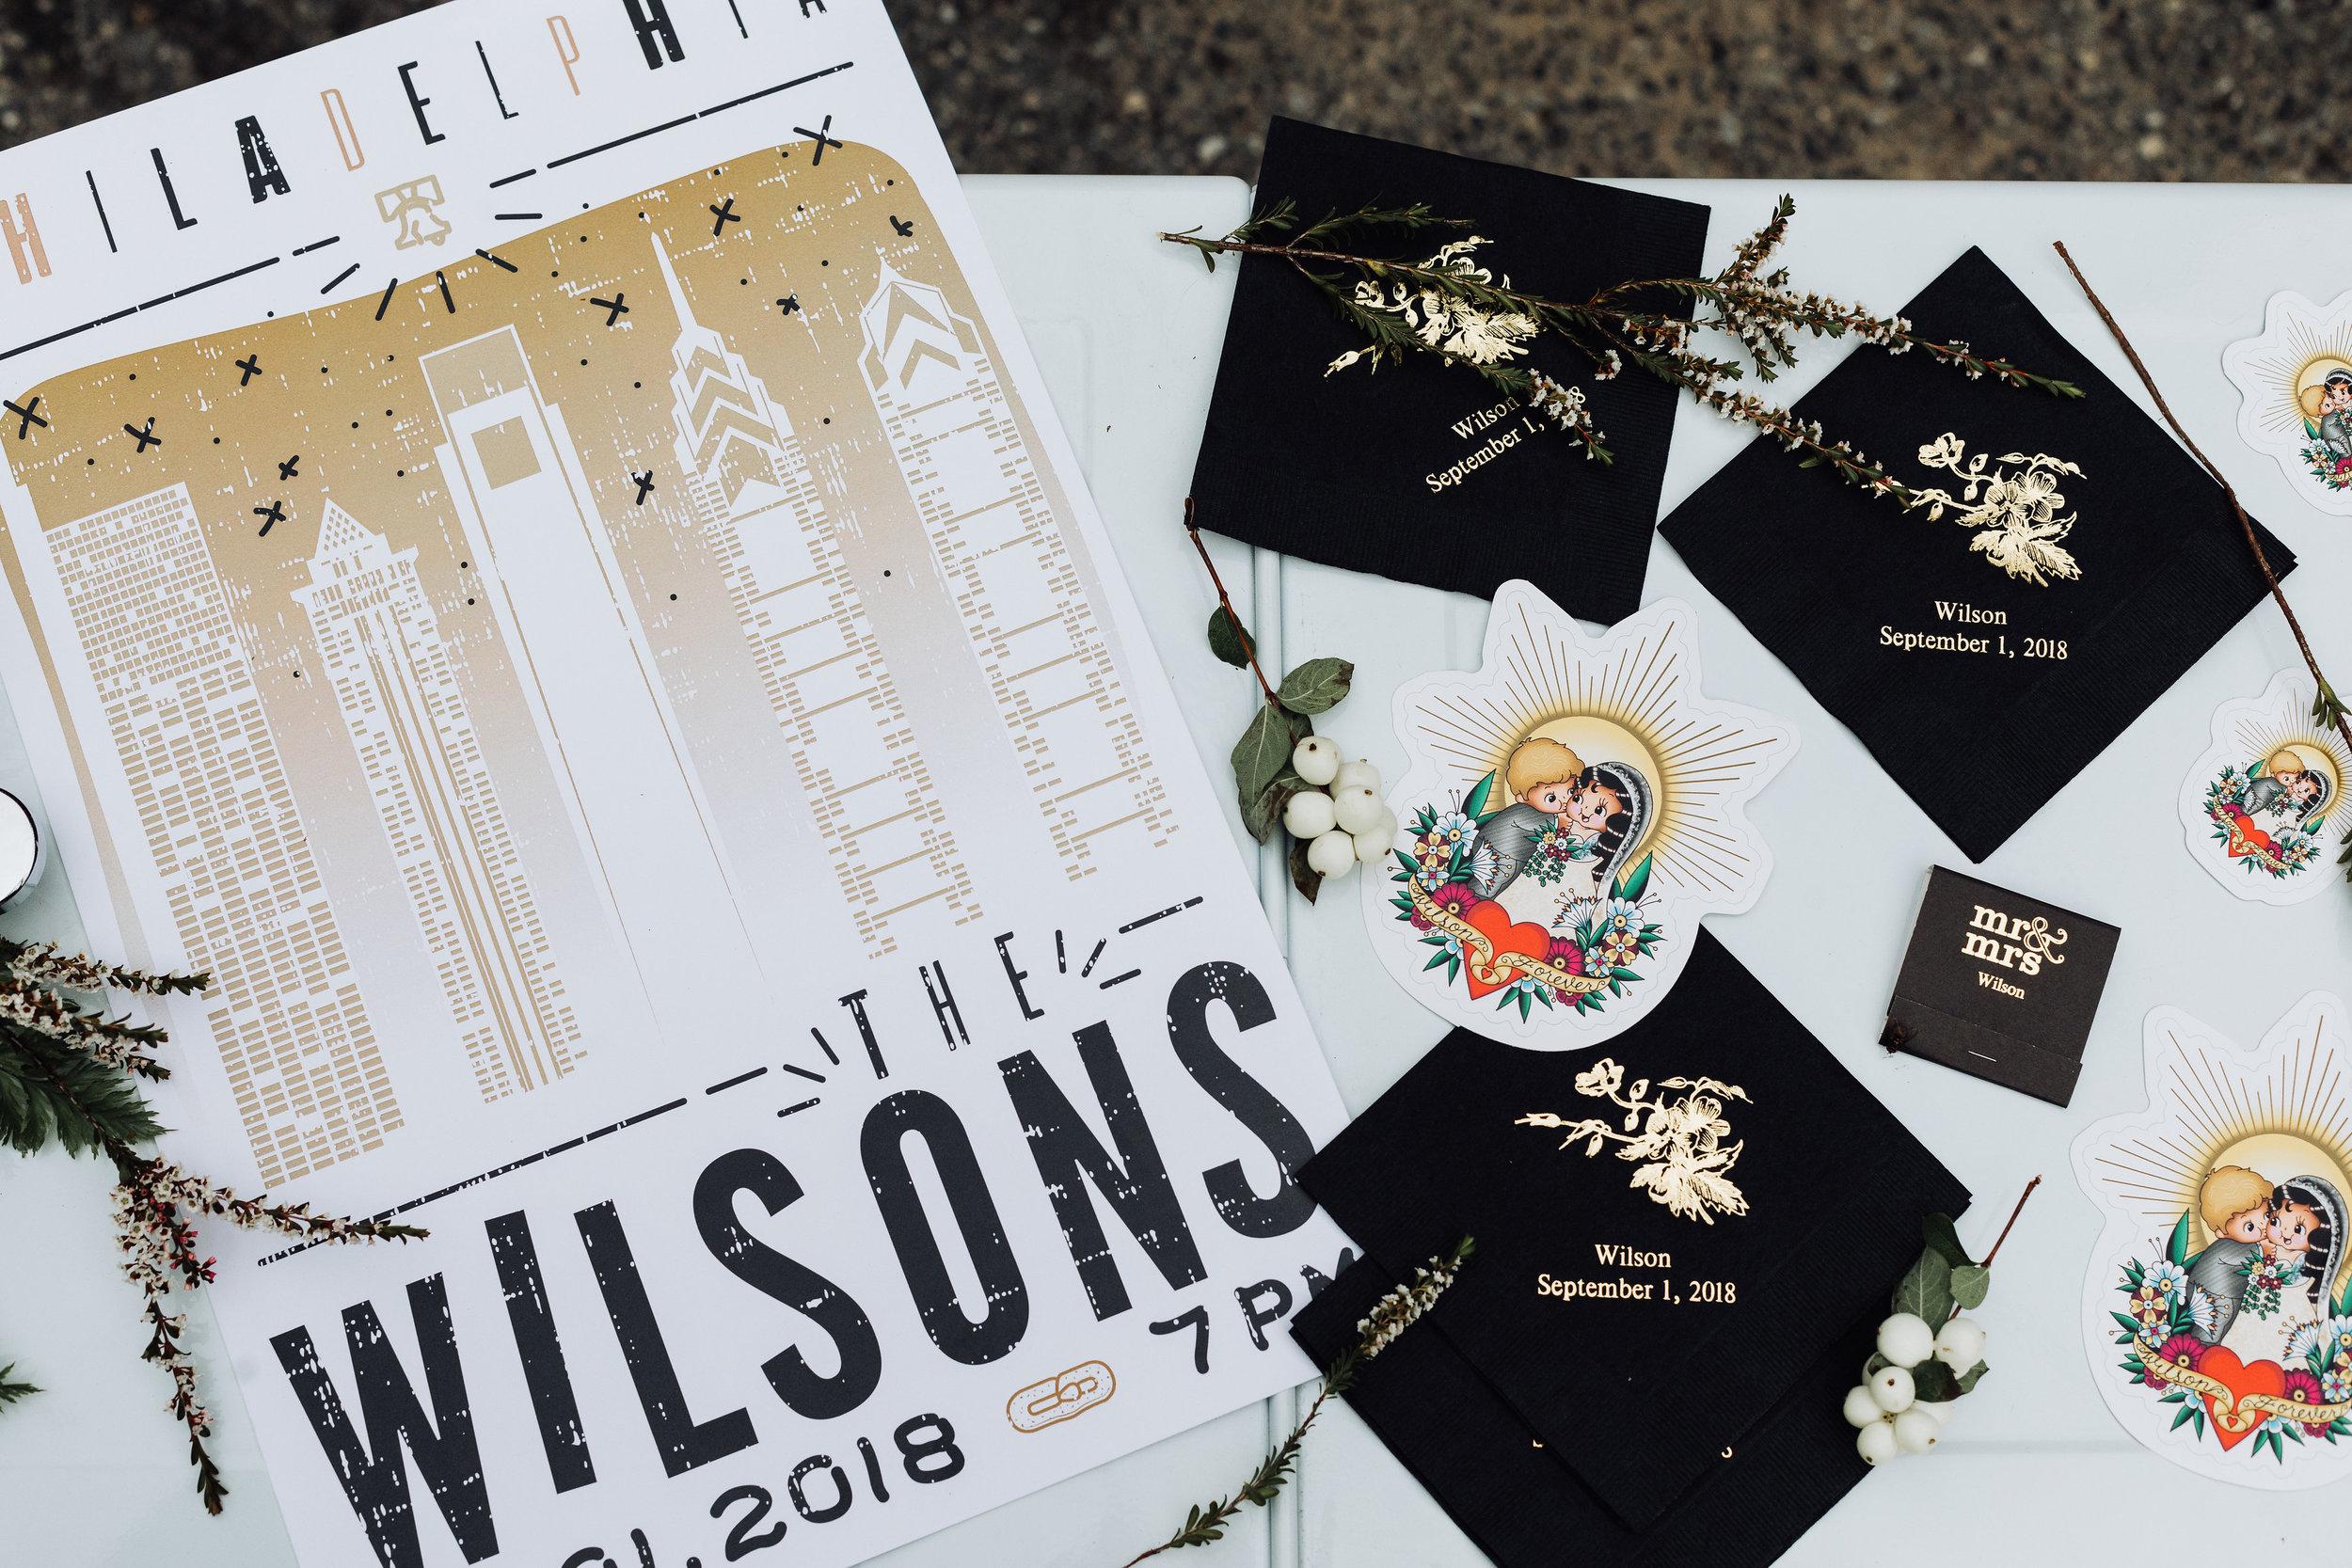 Wilson-31.jpg